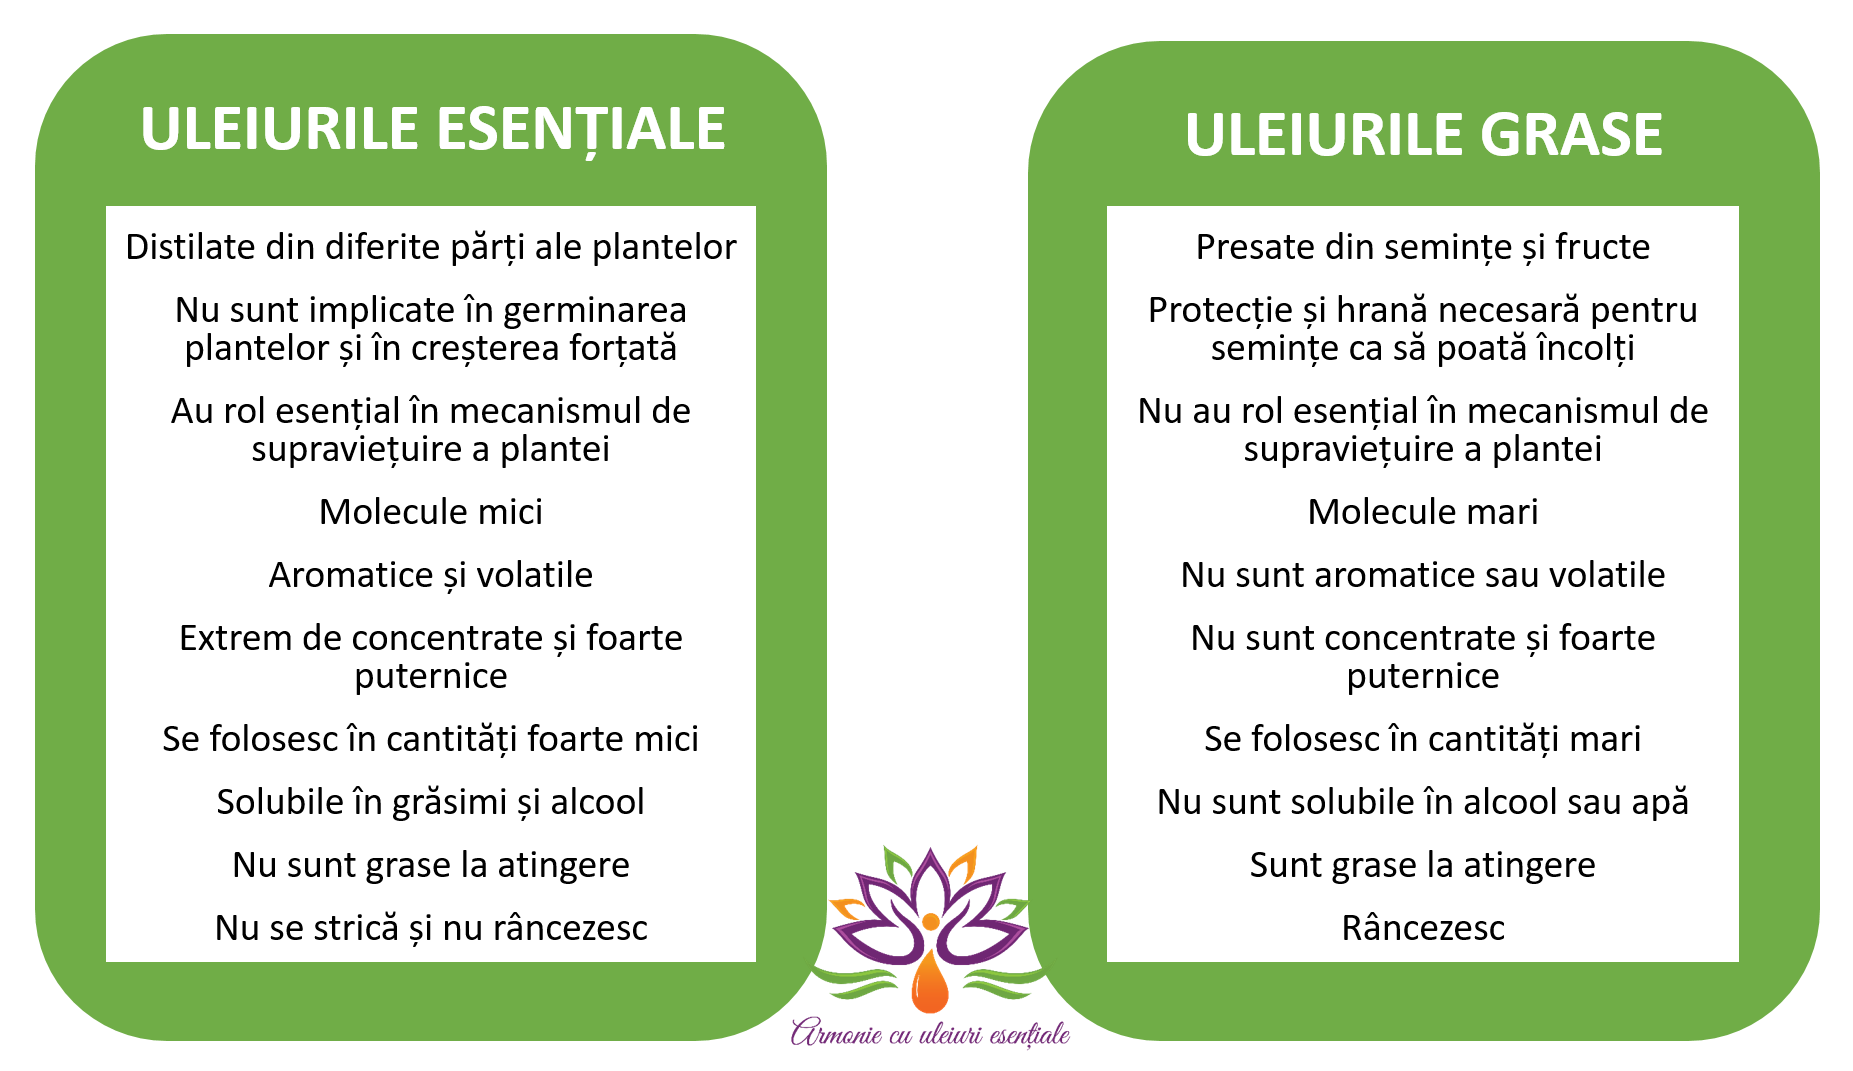 Uleiuri esentiale vs. uleiuri grase